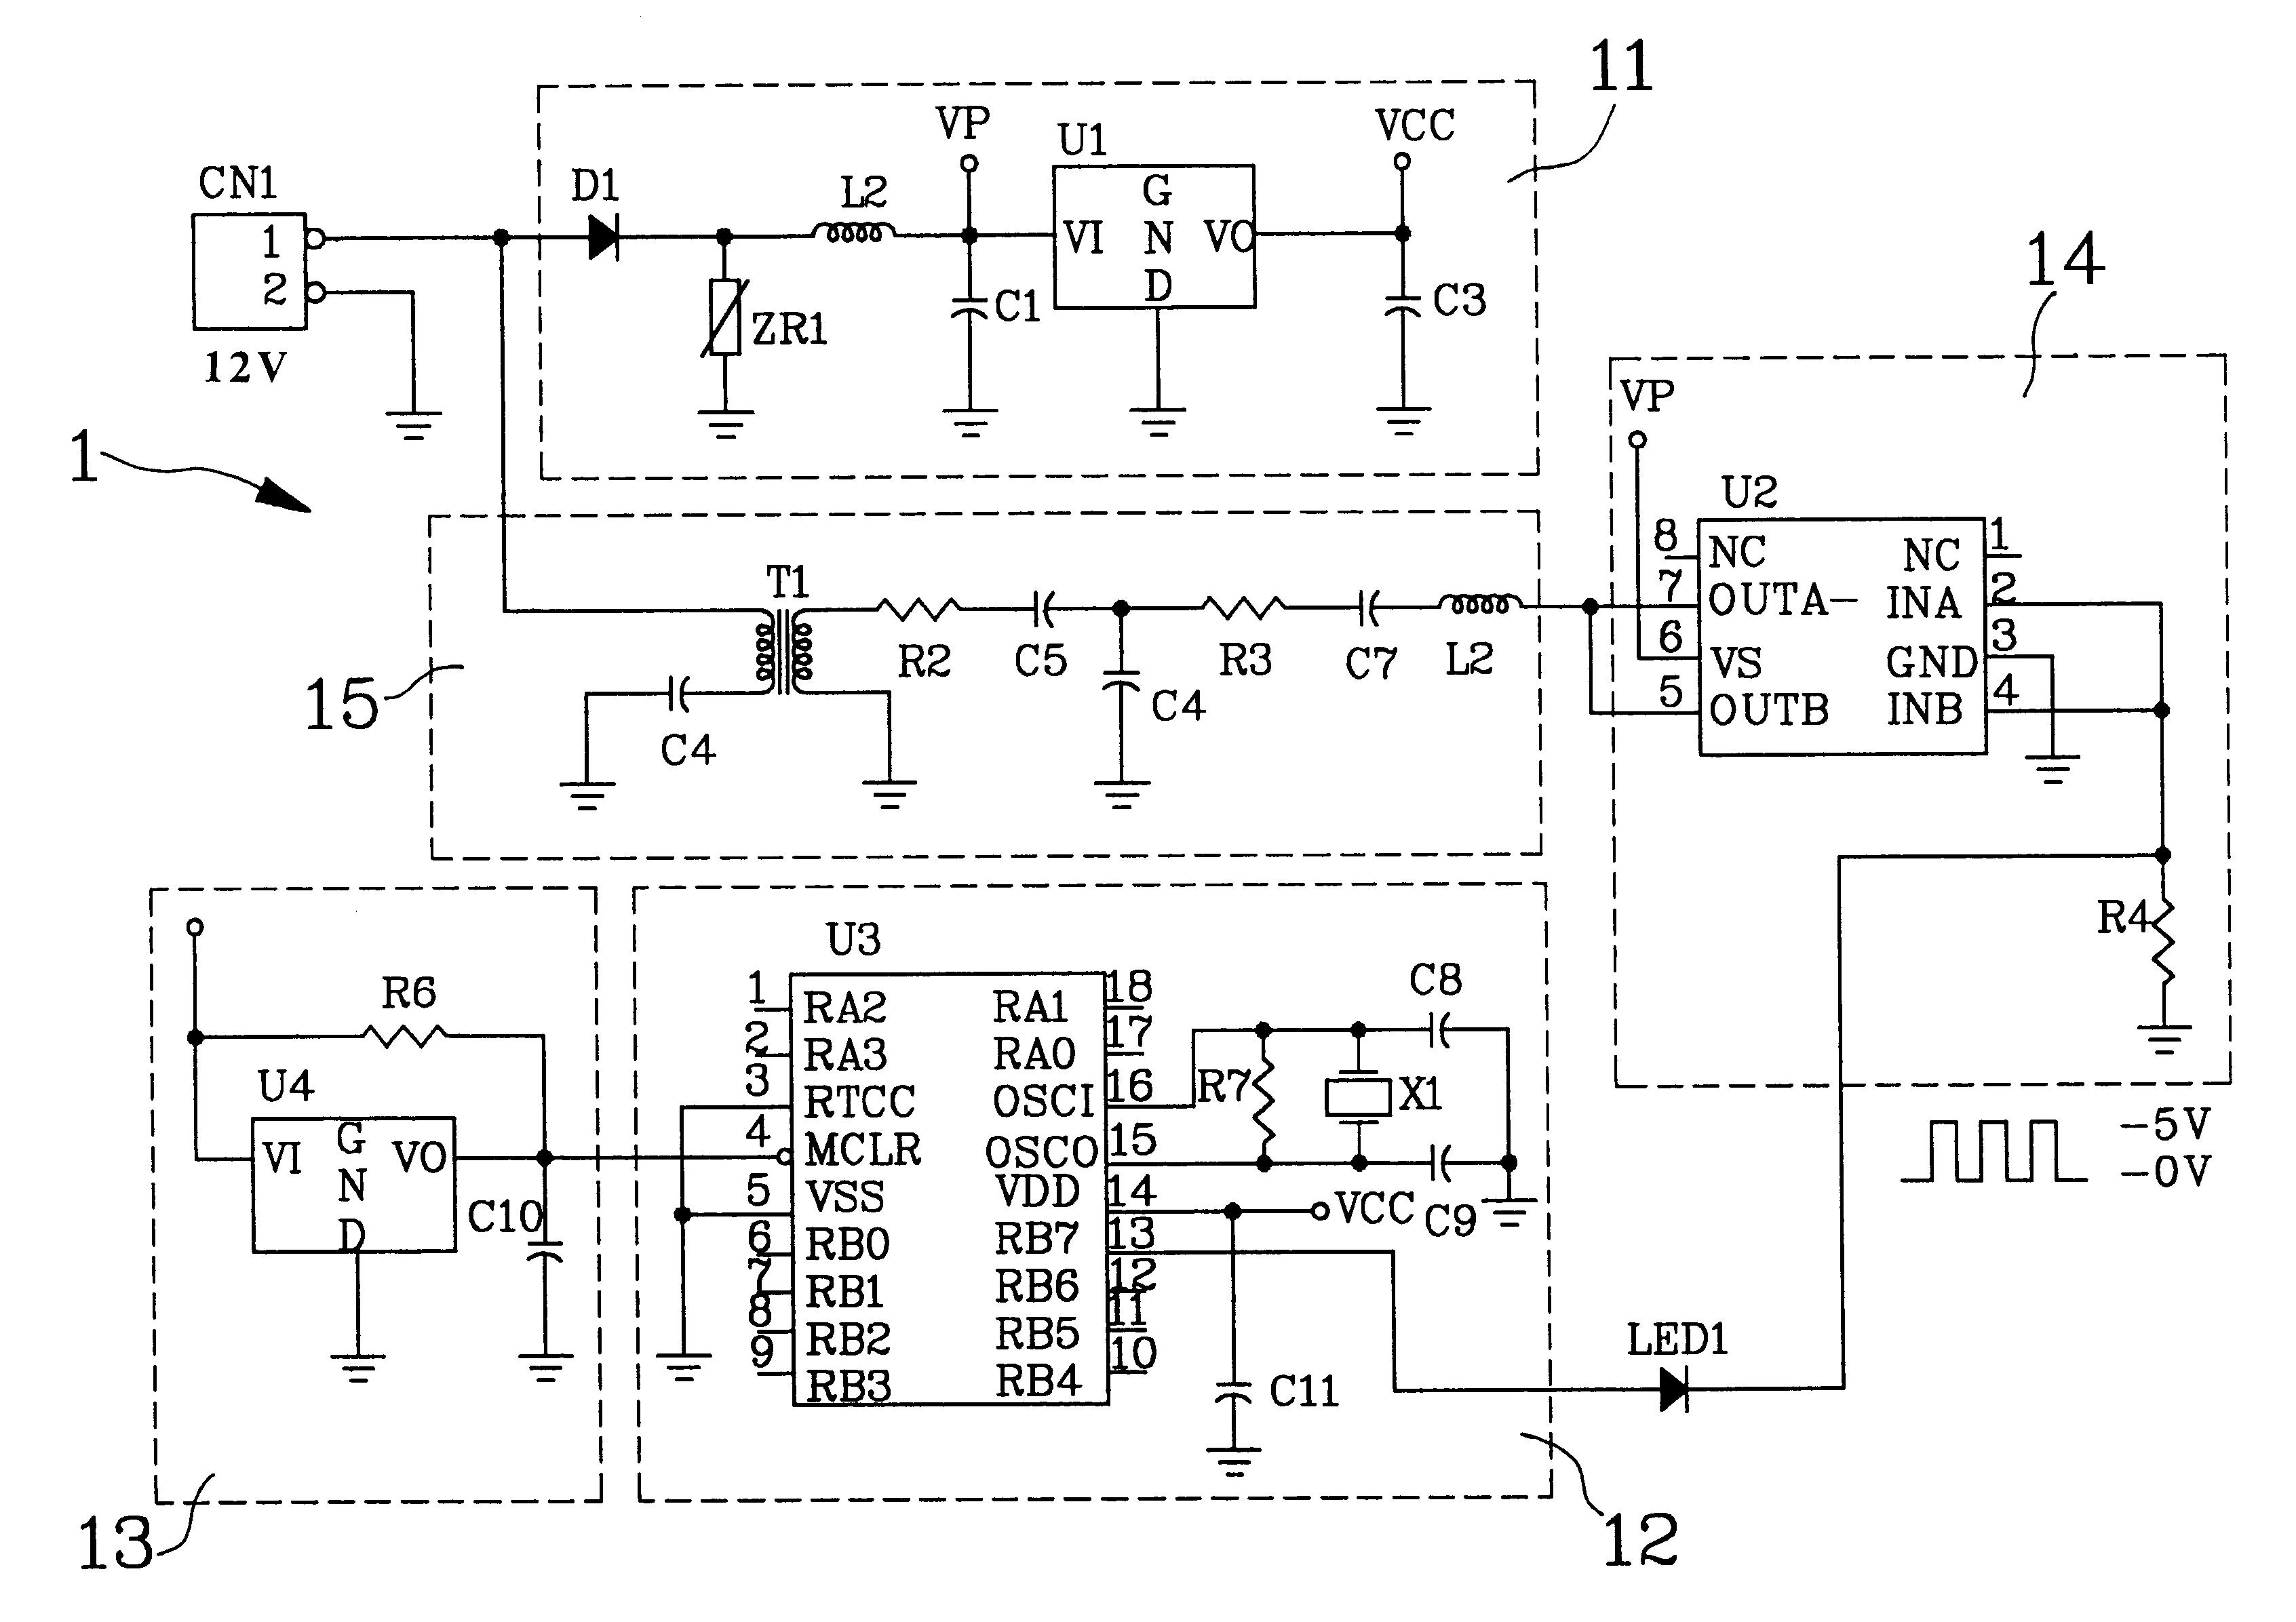 crossfire 150 wiring diagram, gy6 150cc fuel pump, yamaha zuma 50 wiring diagram, gy6 50cc wiring-diagram, gy6 150cc carburetor, jonway wiring diagram, chinese scooter carburetor diagram, 150cc scooter carb diagram, gy6 150cc clutch, 150cc scooter wiring diagram, 150cc engine diagram, gy6 150cc troubleshooting, gy6 150cc spark plug, gy6 150cc voltage, gy6 150cc oil pump, gy6 ignition wiring, gy6 150cc headlights, 50cc scooter wiring diagram, gy6 150cc coil, gy6 150cc ignition switch, on 150cc gy6 simple wiring diagram